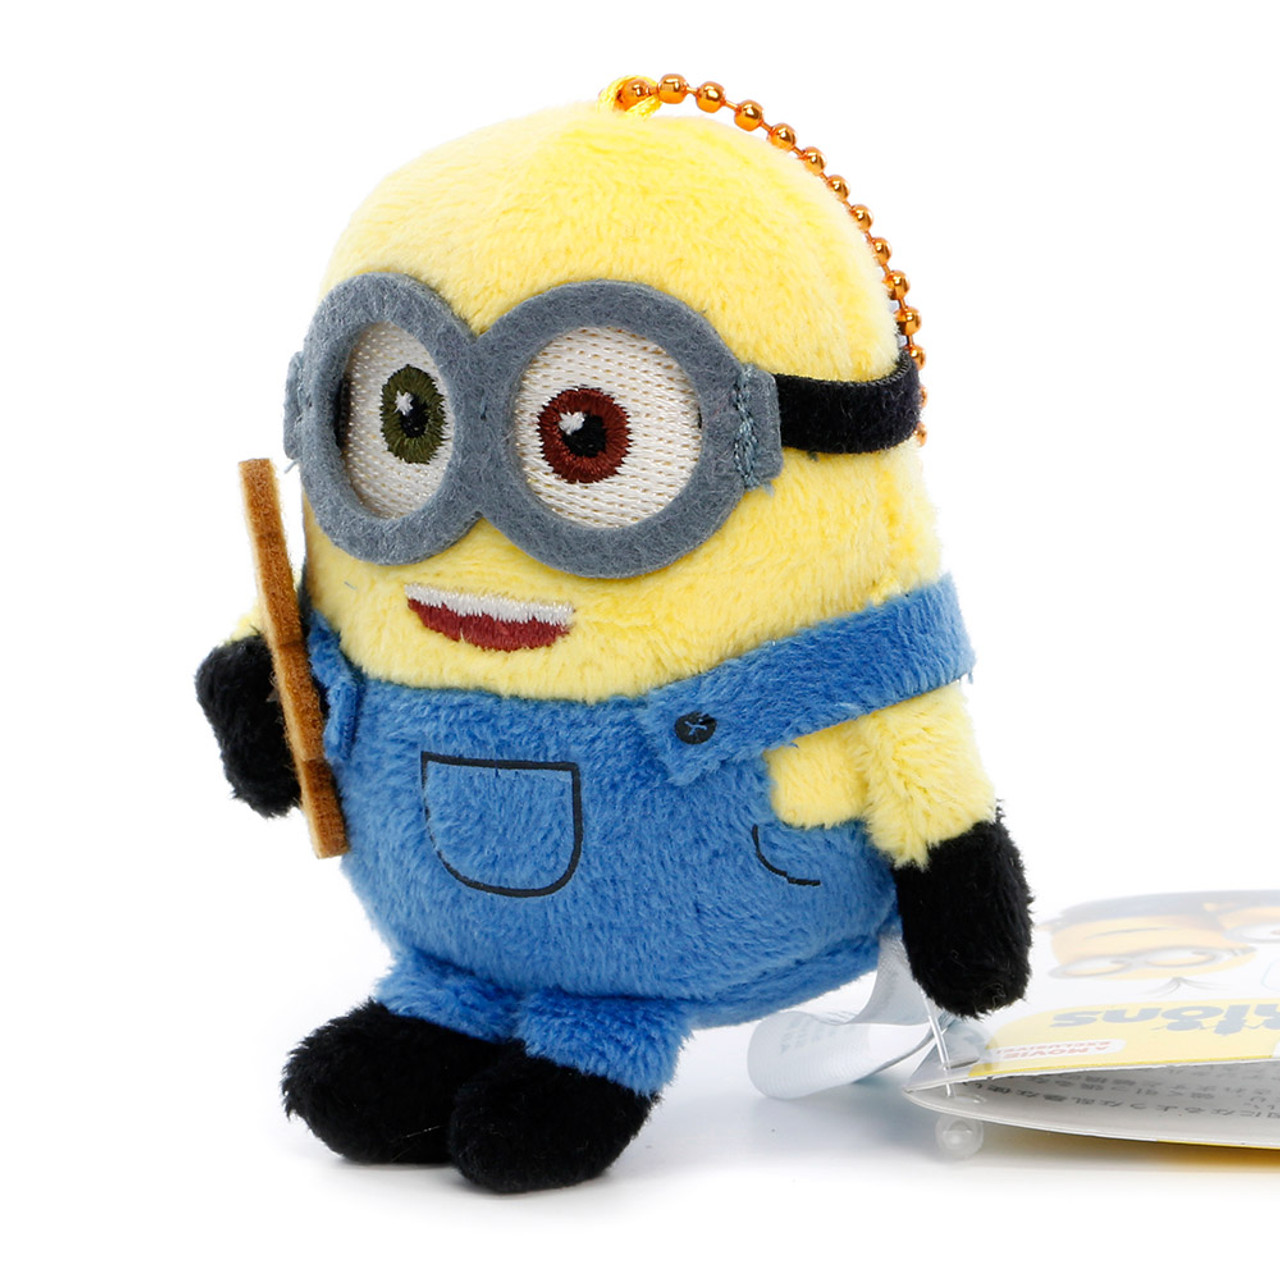 Bob The Minions Mascot Plush Doll Charms ( Side View )